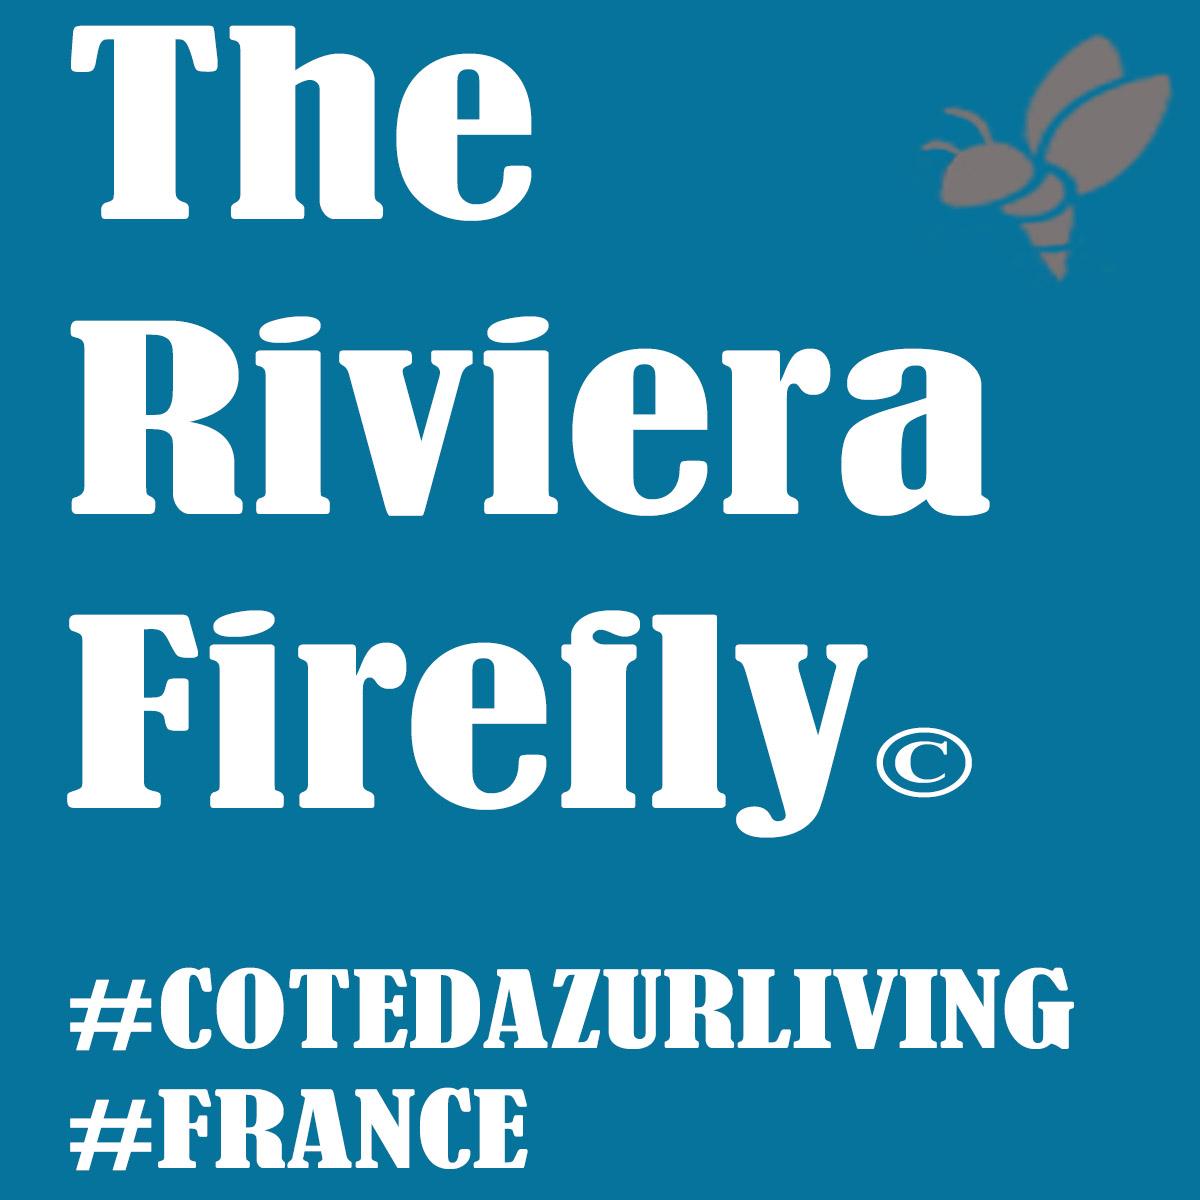 French Riviera Firefly Podcast logo